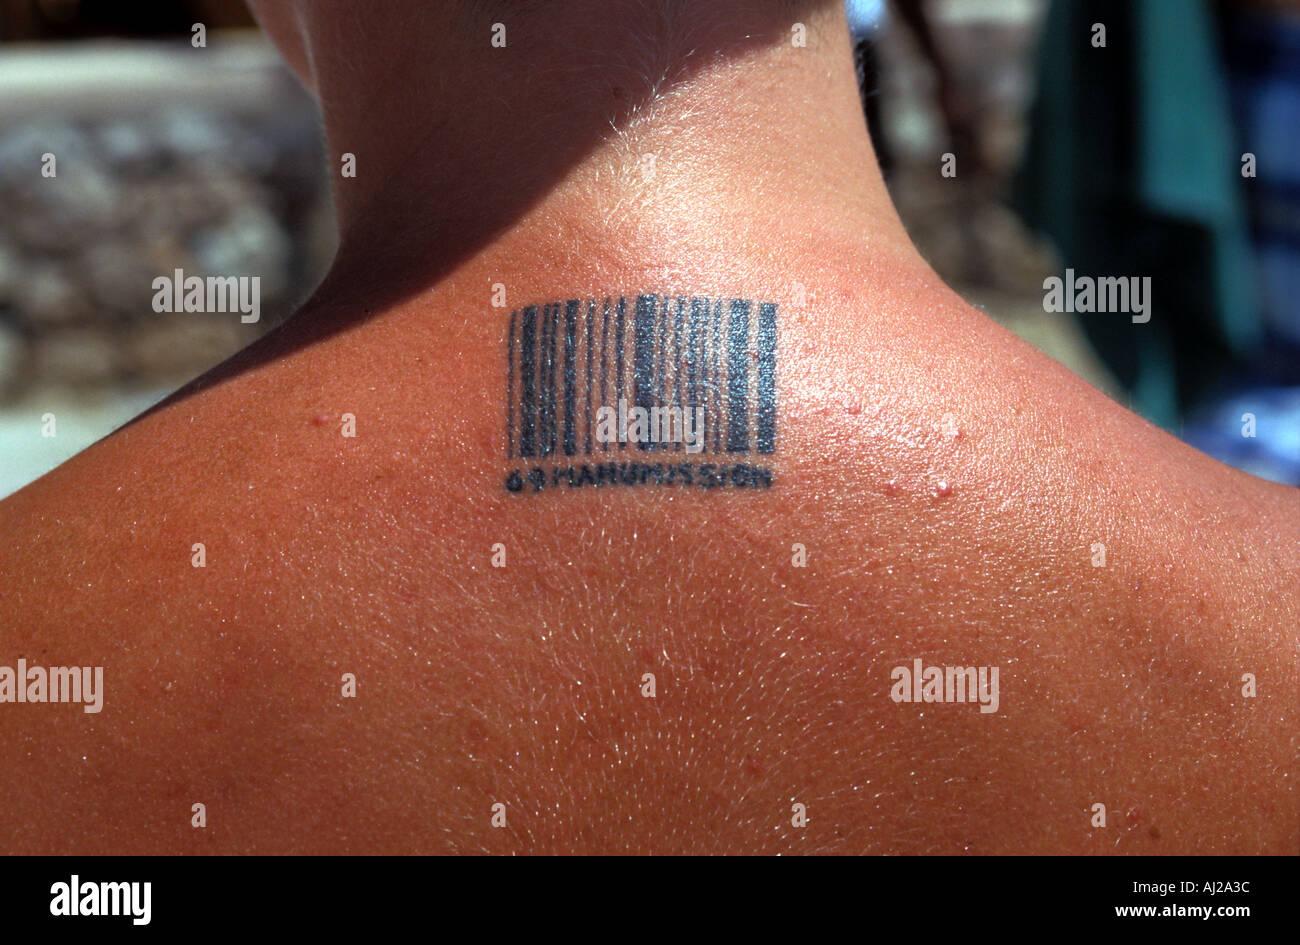 Young British Woman With Manumission Barcode Tattoo Ibiza